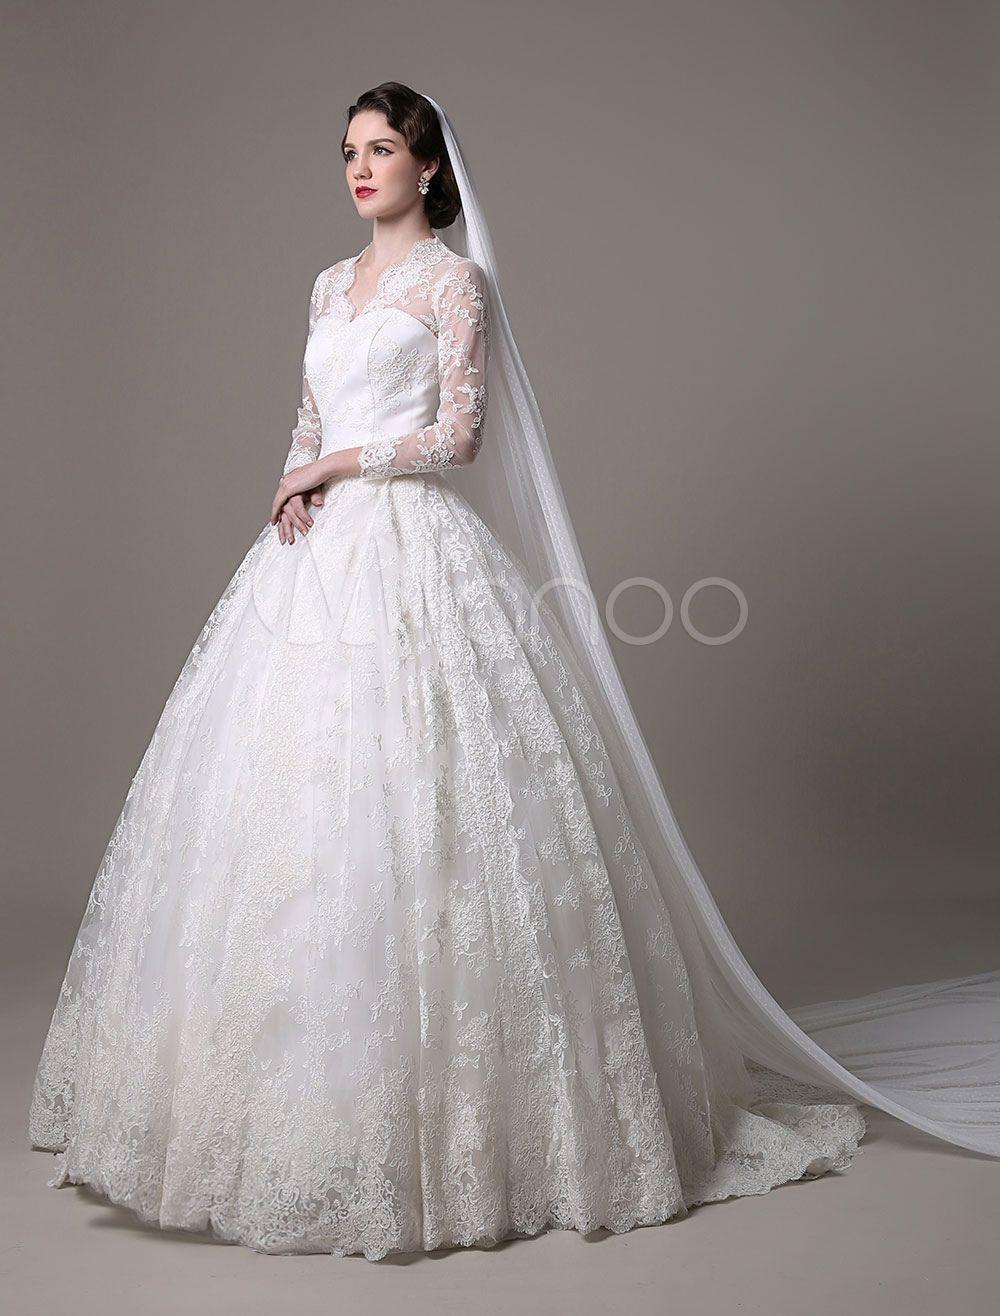 Kate middleton royal wedding dress vintage lace with vneck and long